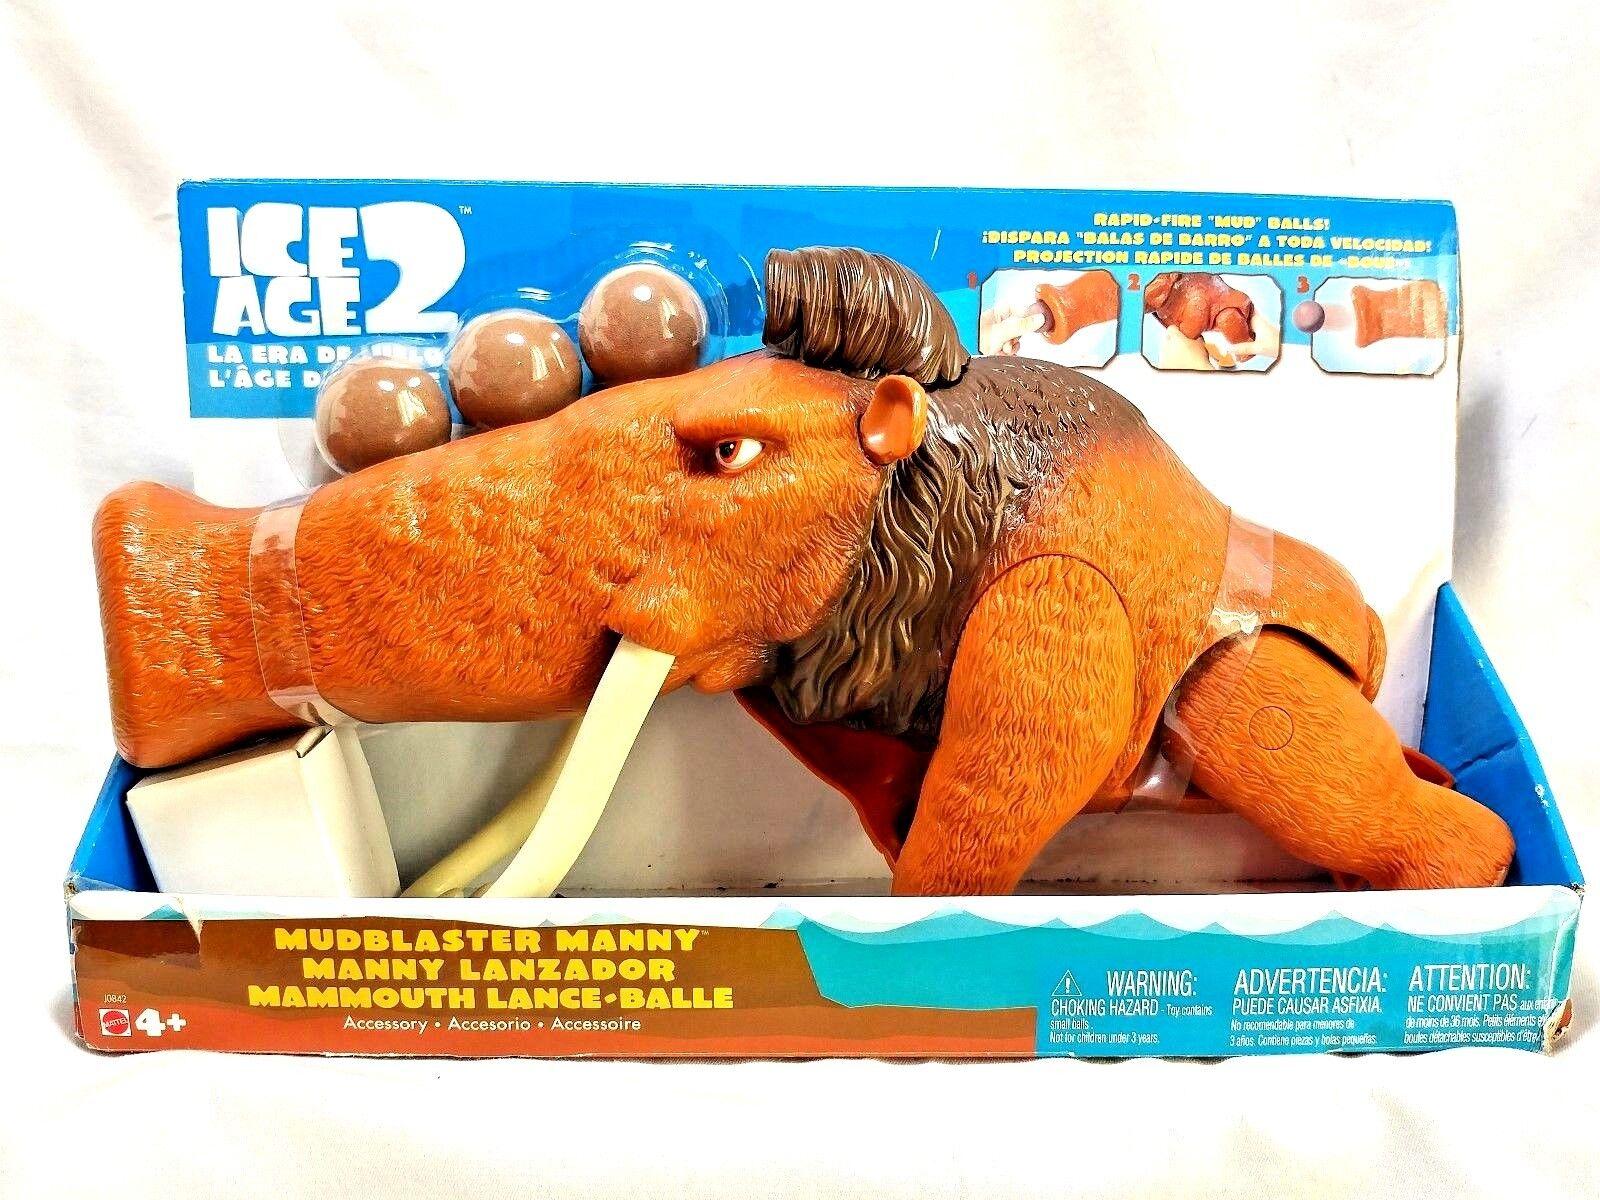 Mattel 2005 Ice Age 2 Mudbalster Manny Mammoth w  Rapid Fire Mud Balls Figure